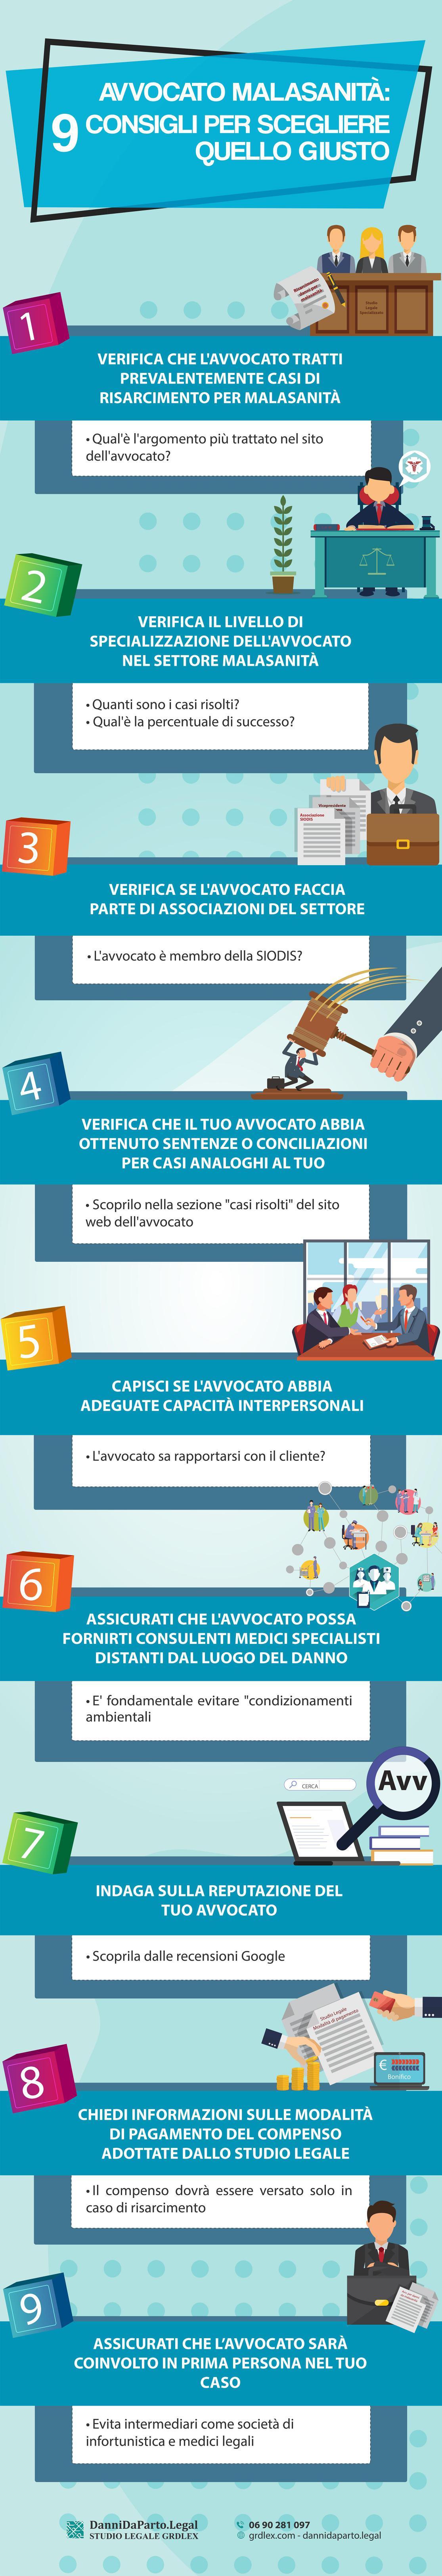 avvocato-malasanita-infografica